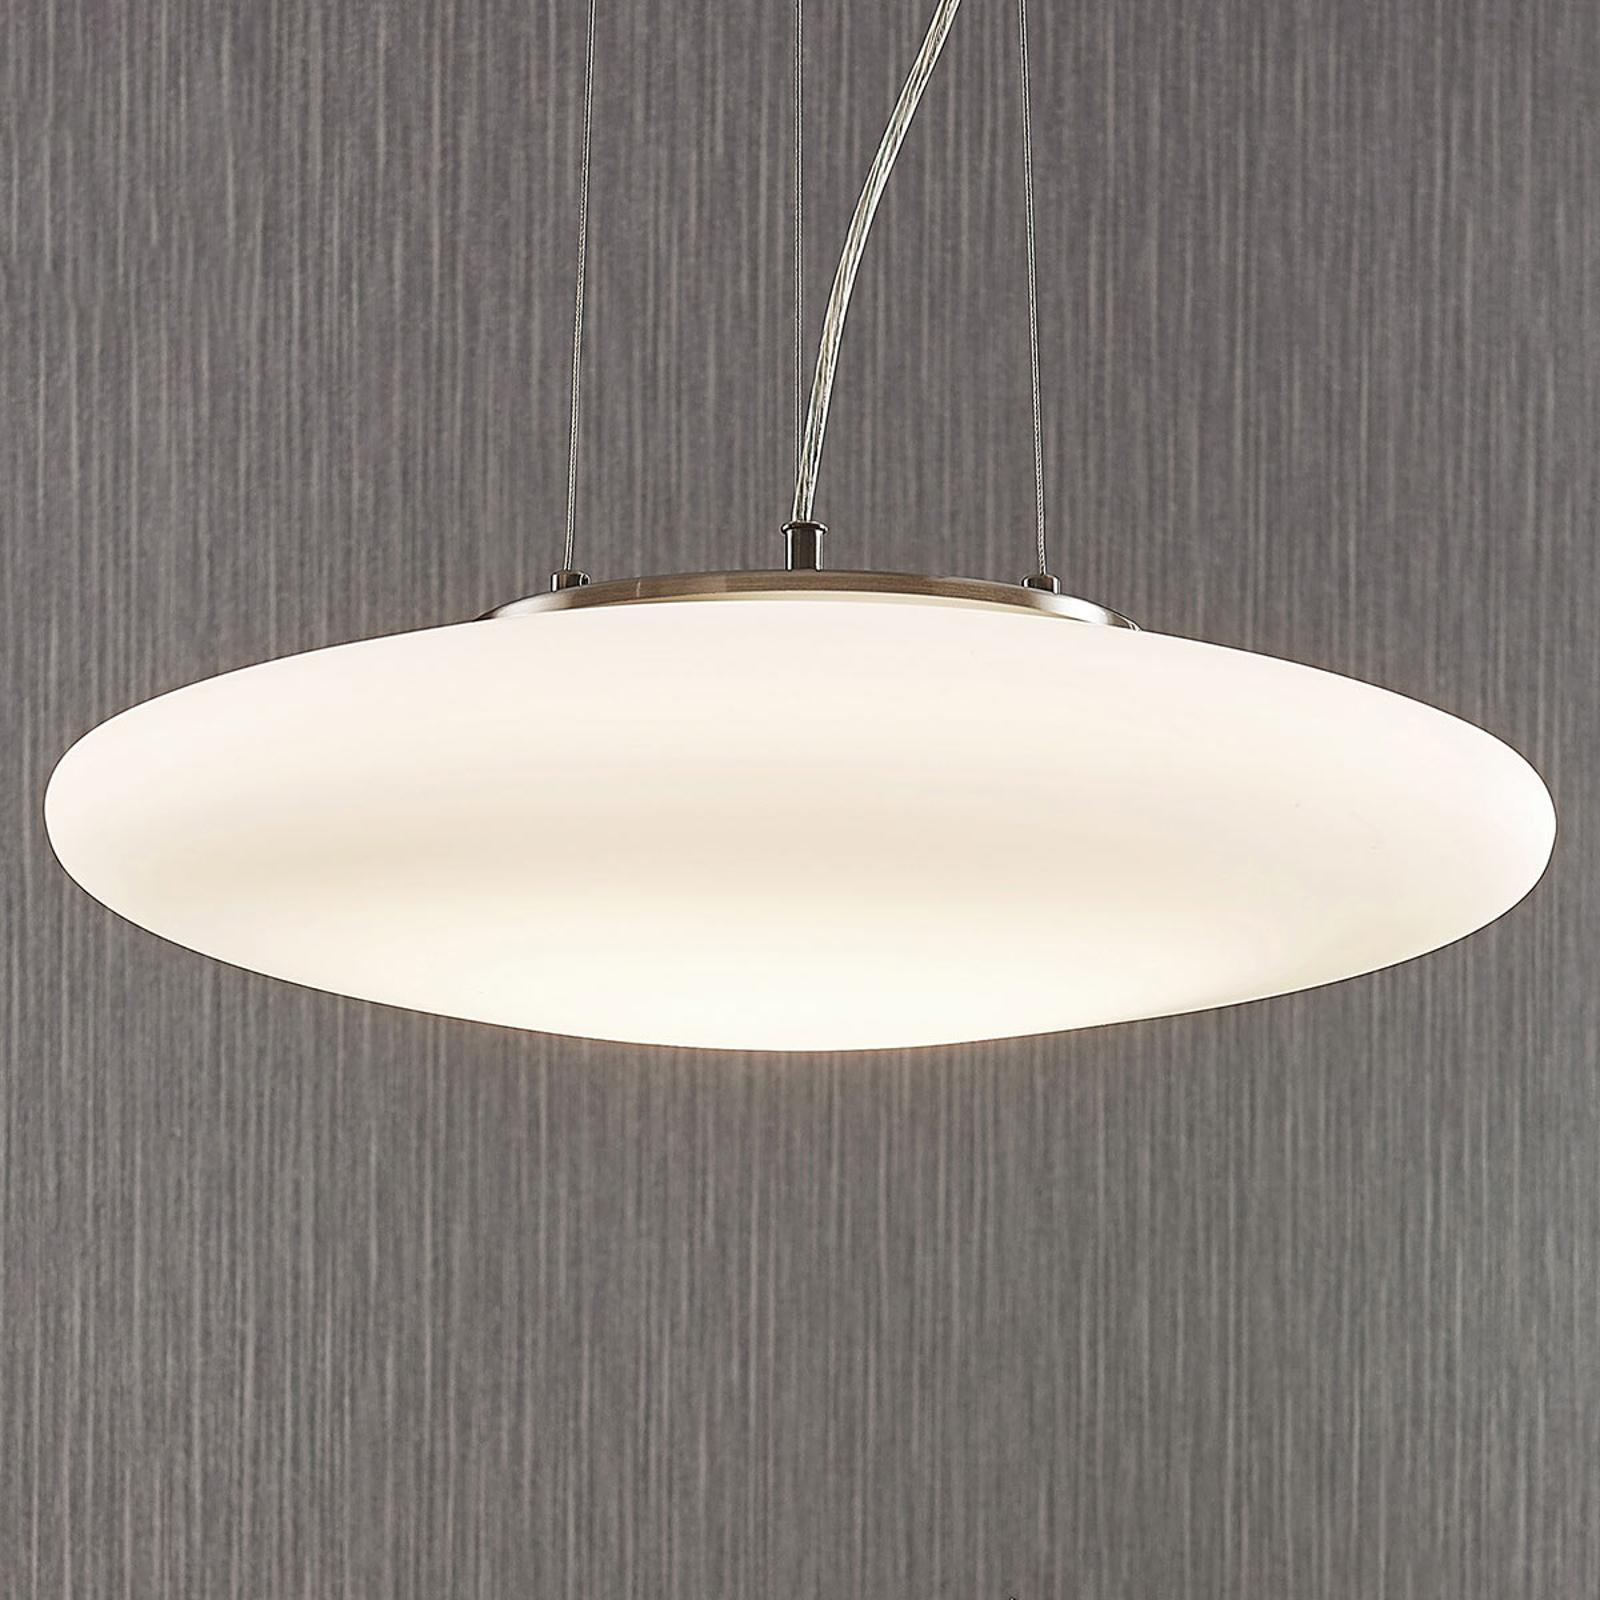 LED-Opalglas-Hängelampe Gunda in Weiß